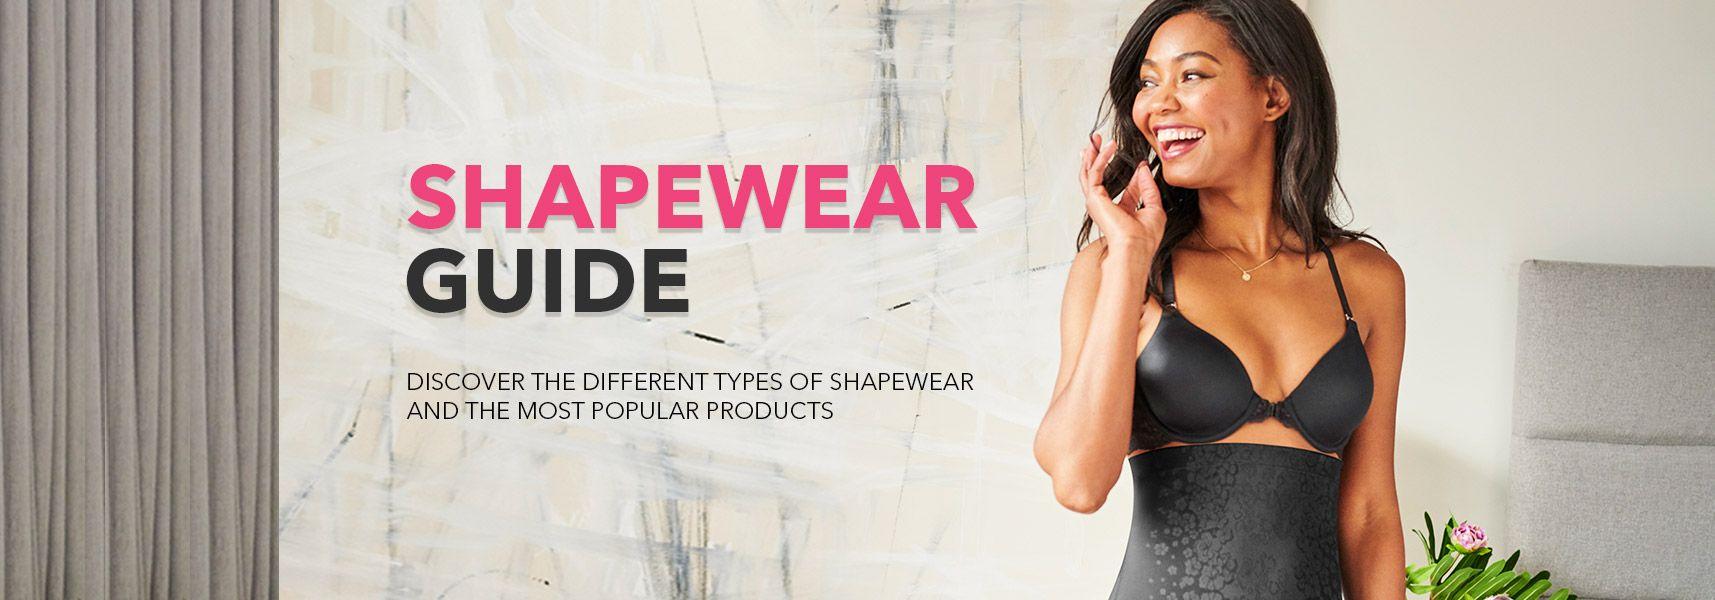 Belle lingerie shapewear guide. Discover popular shapewear styles banner image